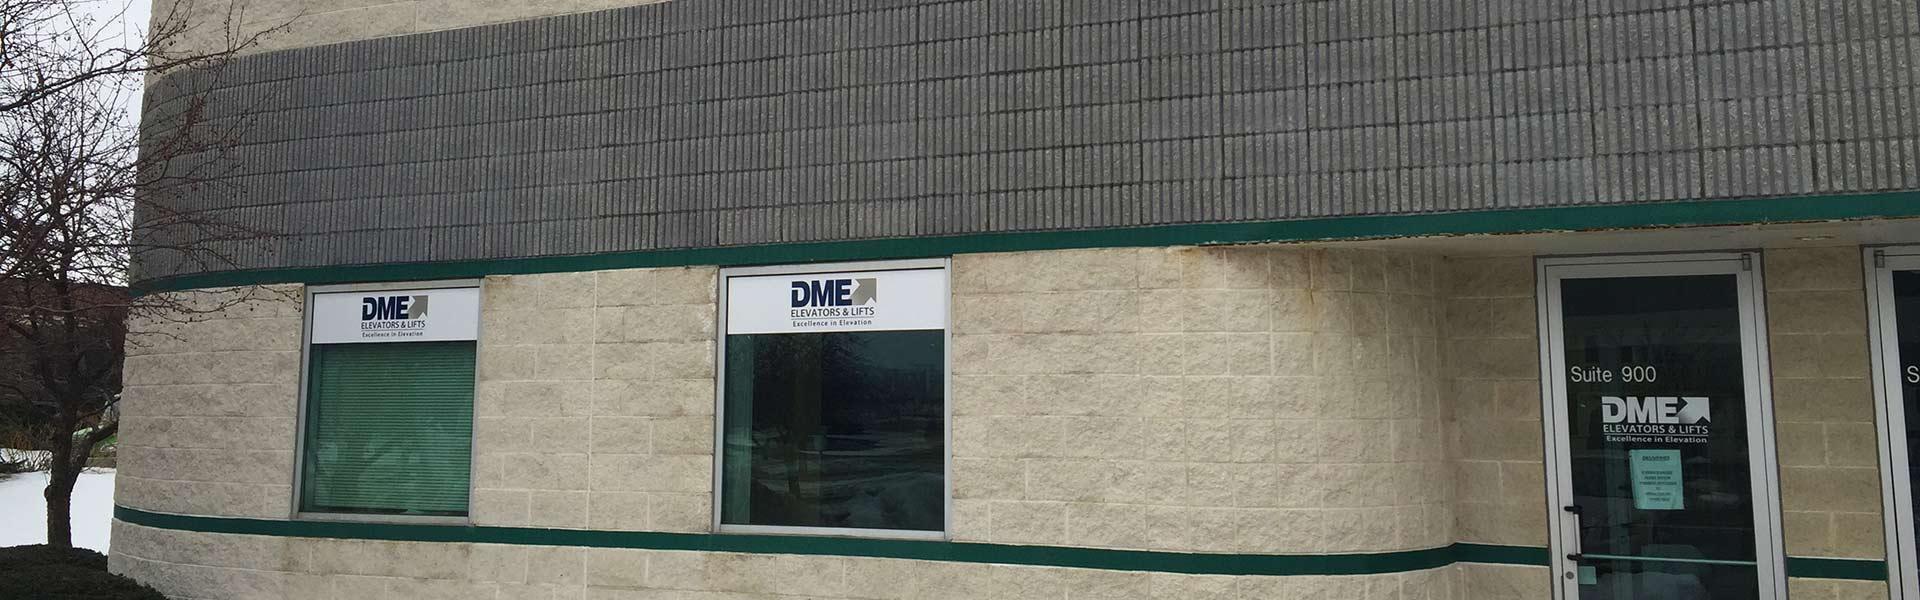 DME 9016 58th Place Kenosha, WI